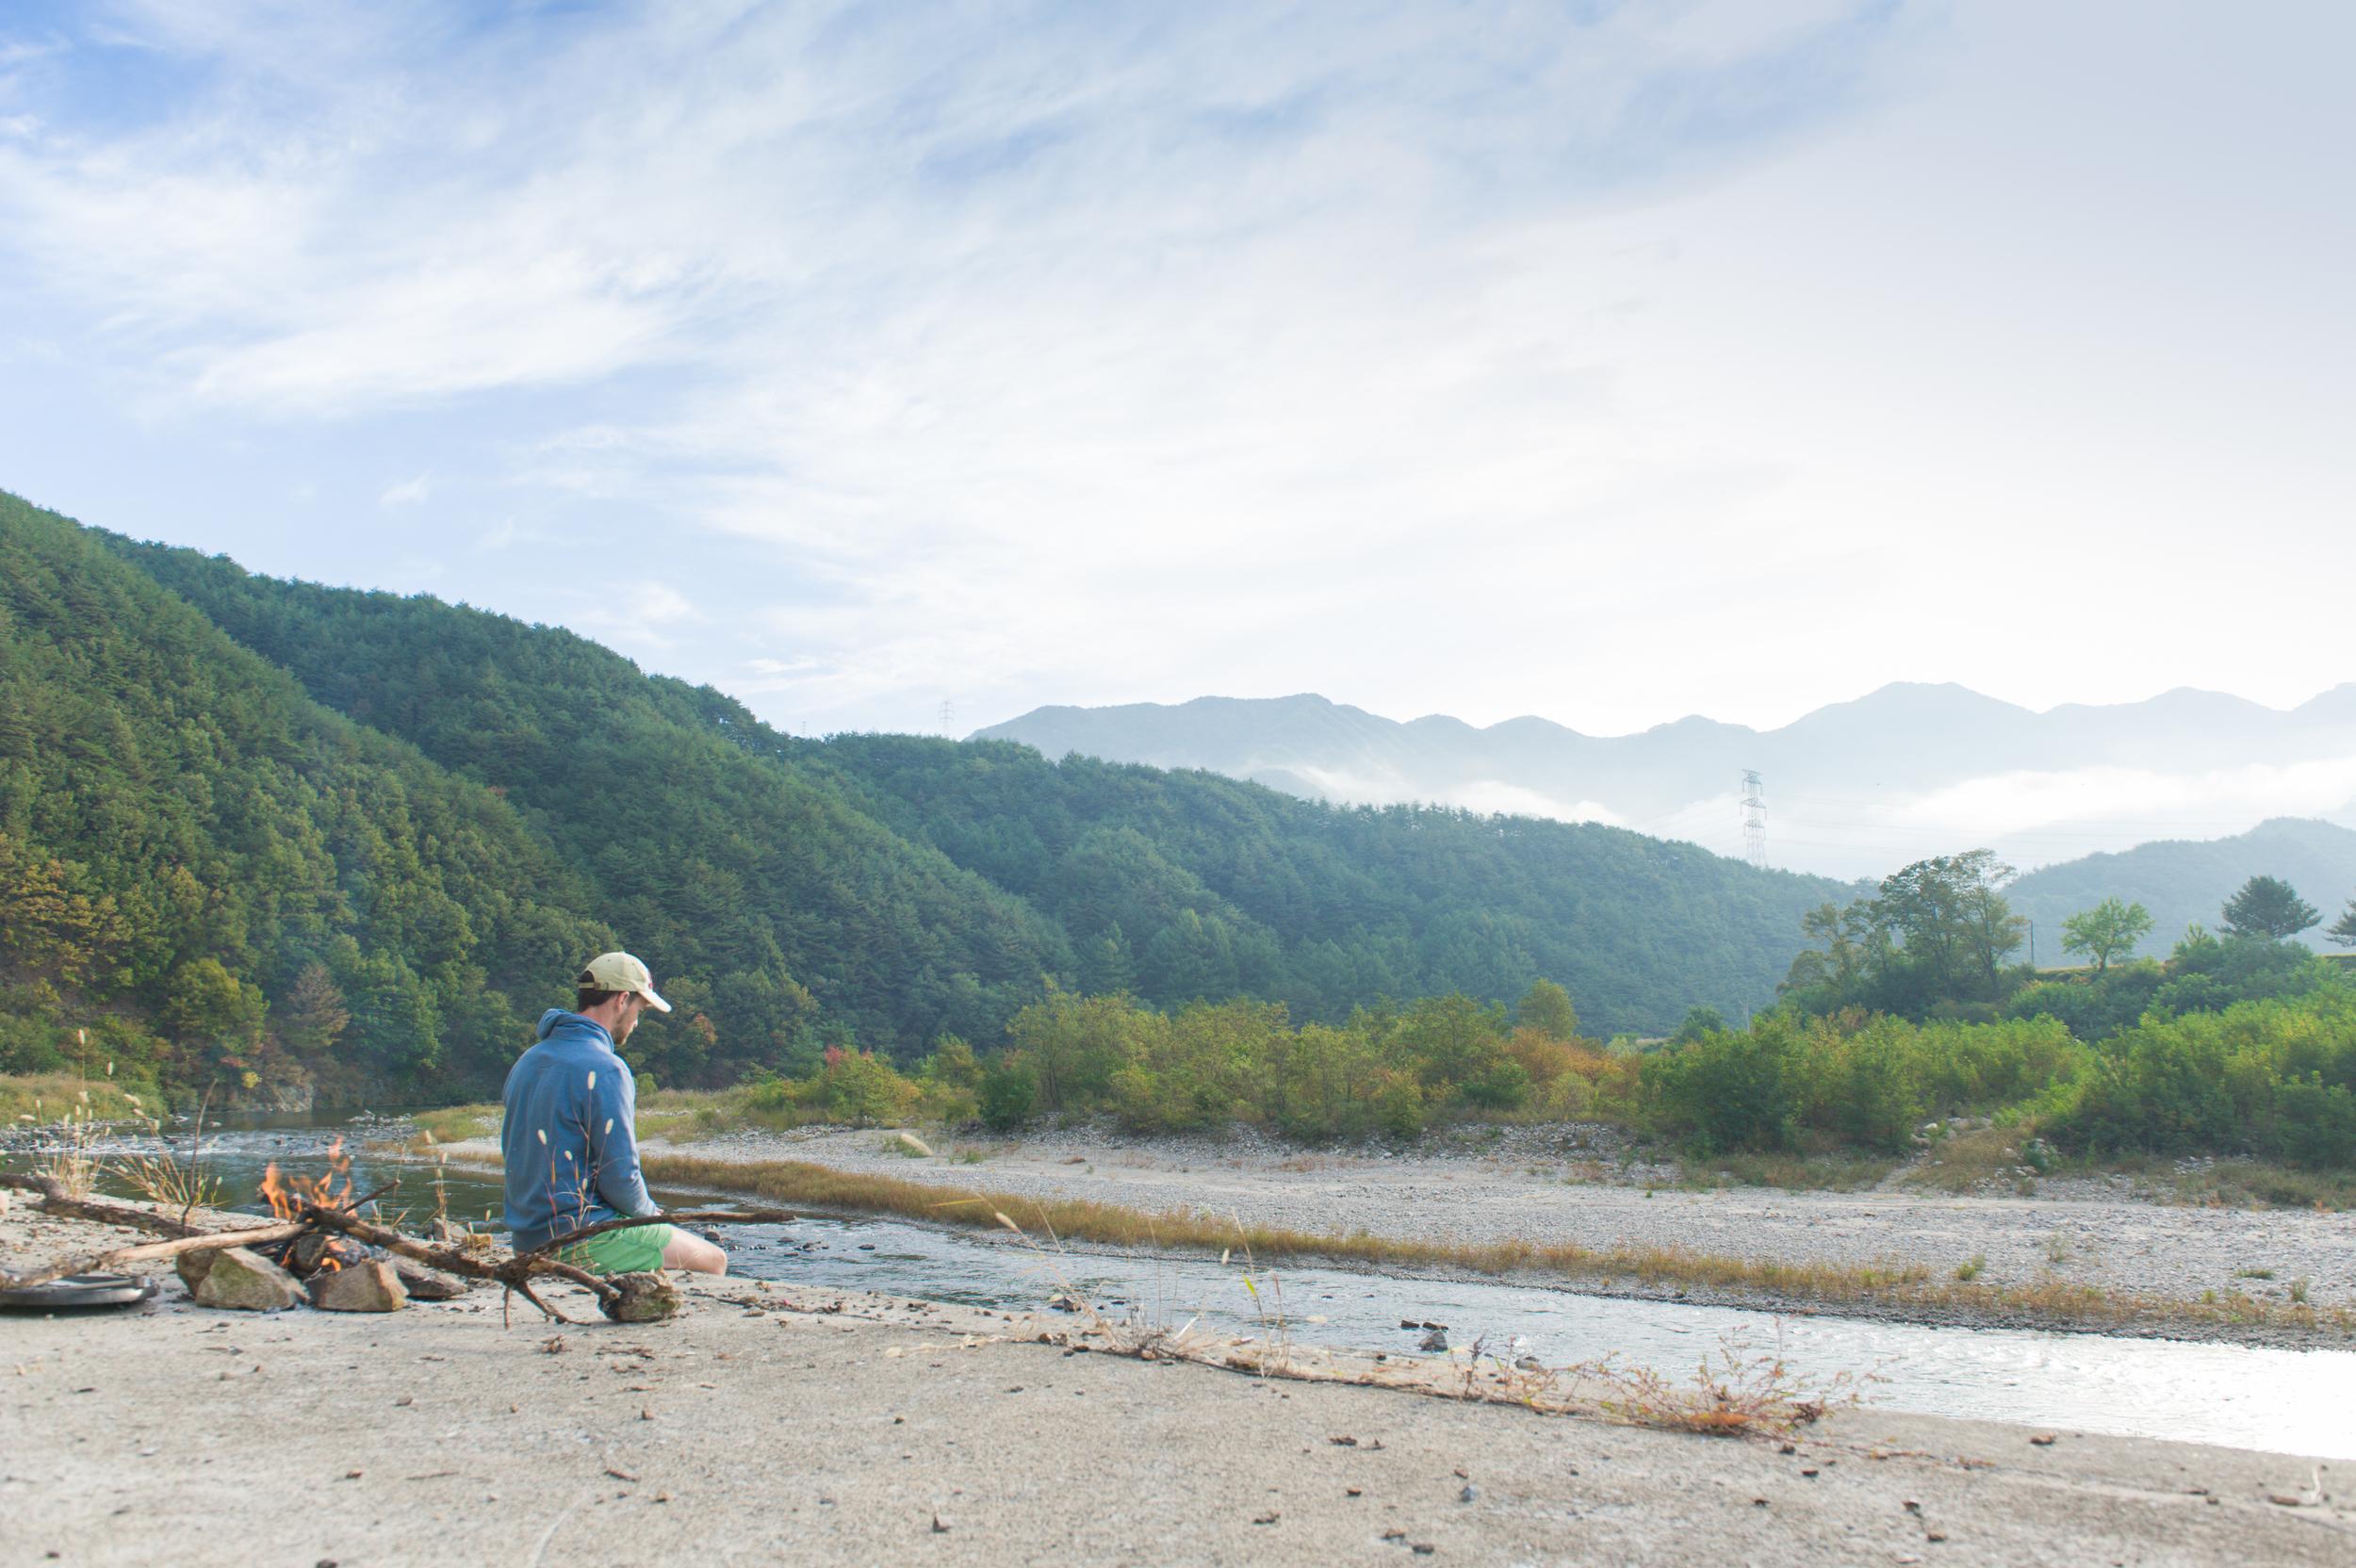 Camping in Korea Chuseok Gangwon Province (70 of 135).jpg